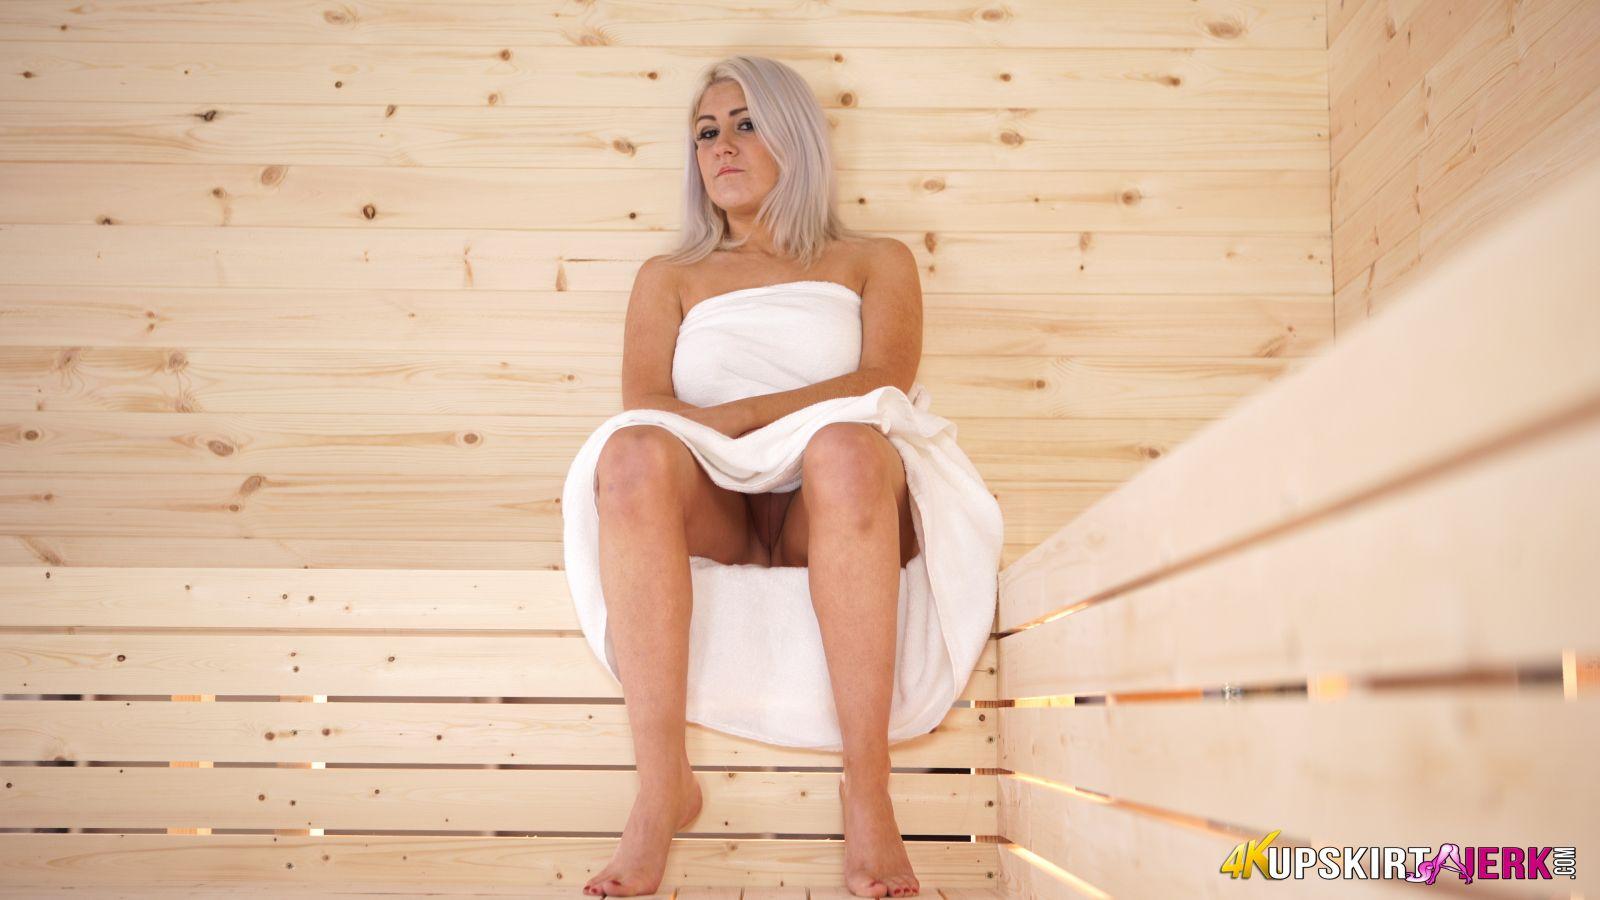 Saunavoyeur